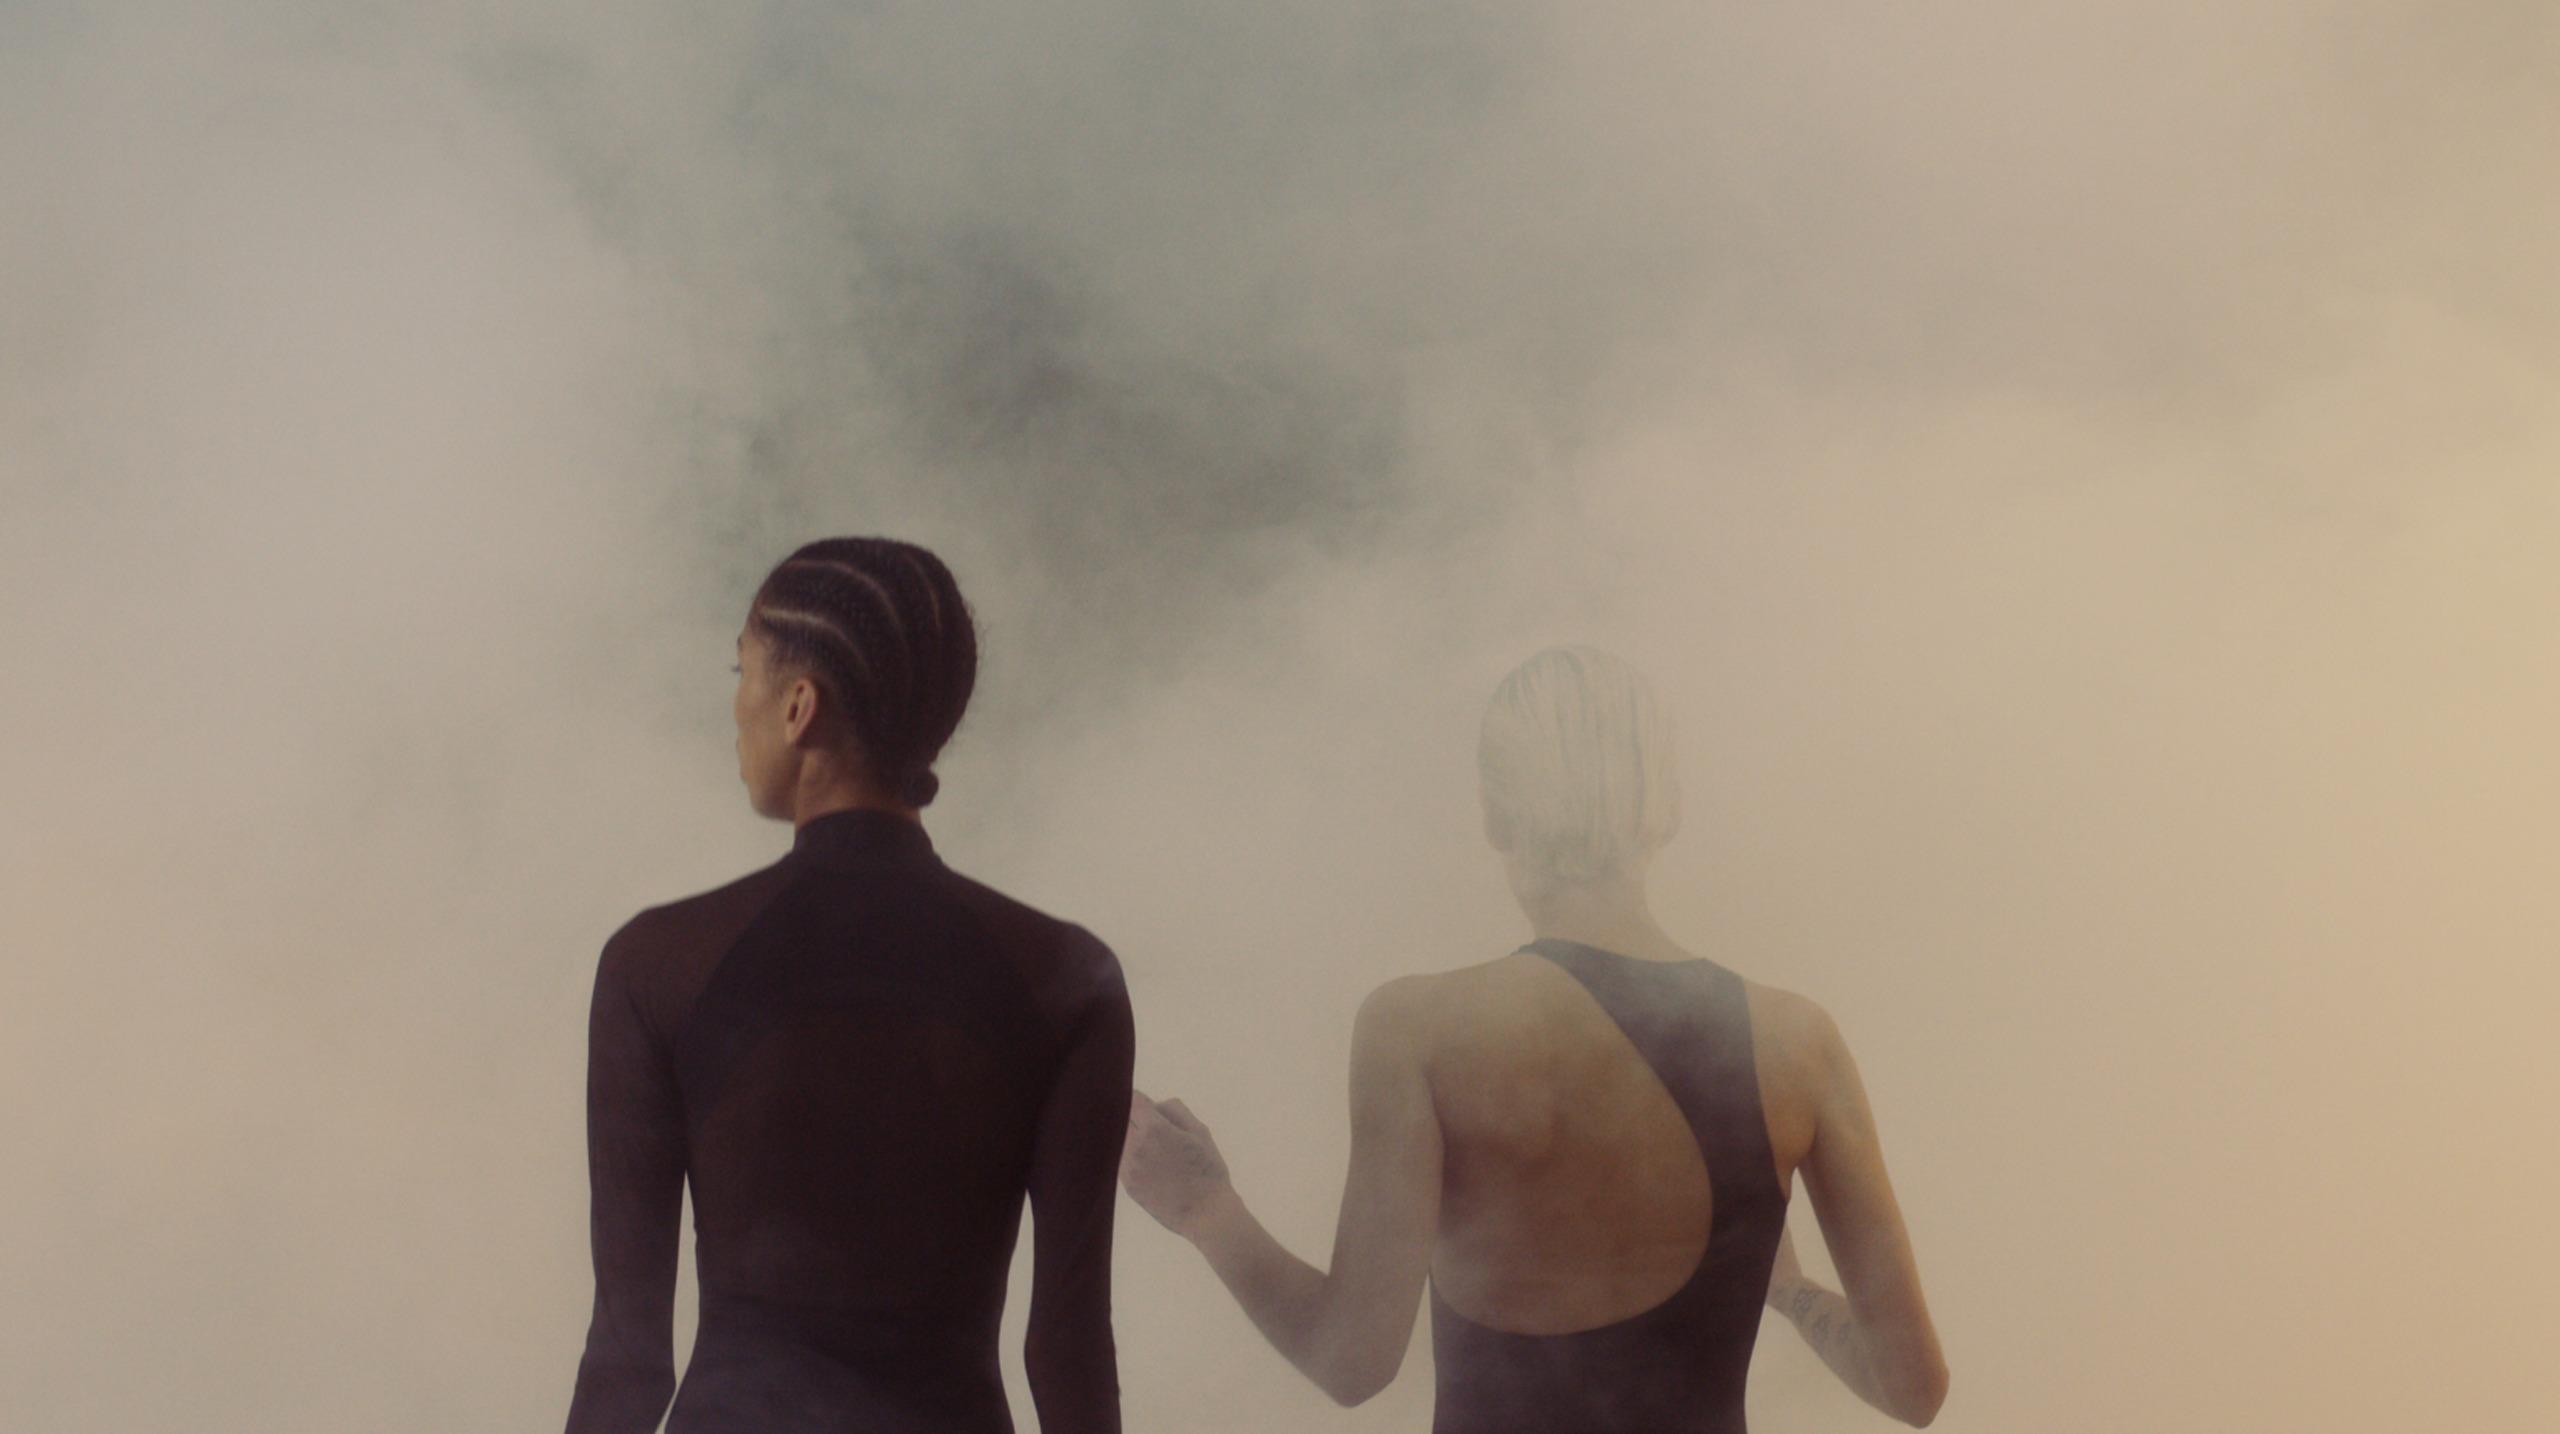 Filmmaker Ch. choreographic fas - fabrik | ello